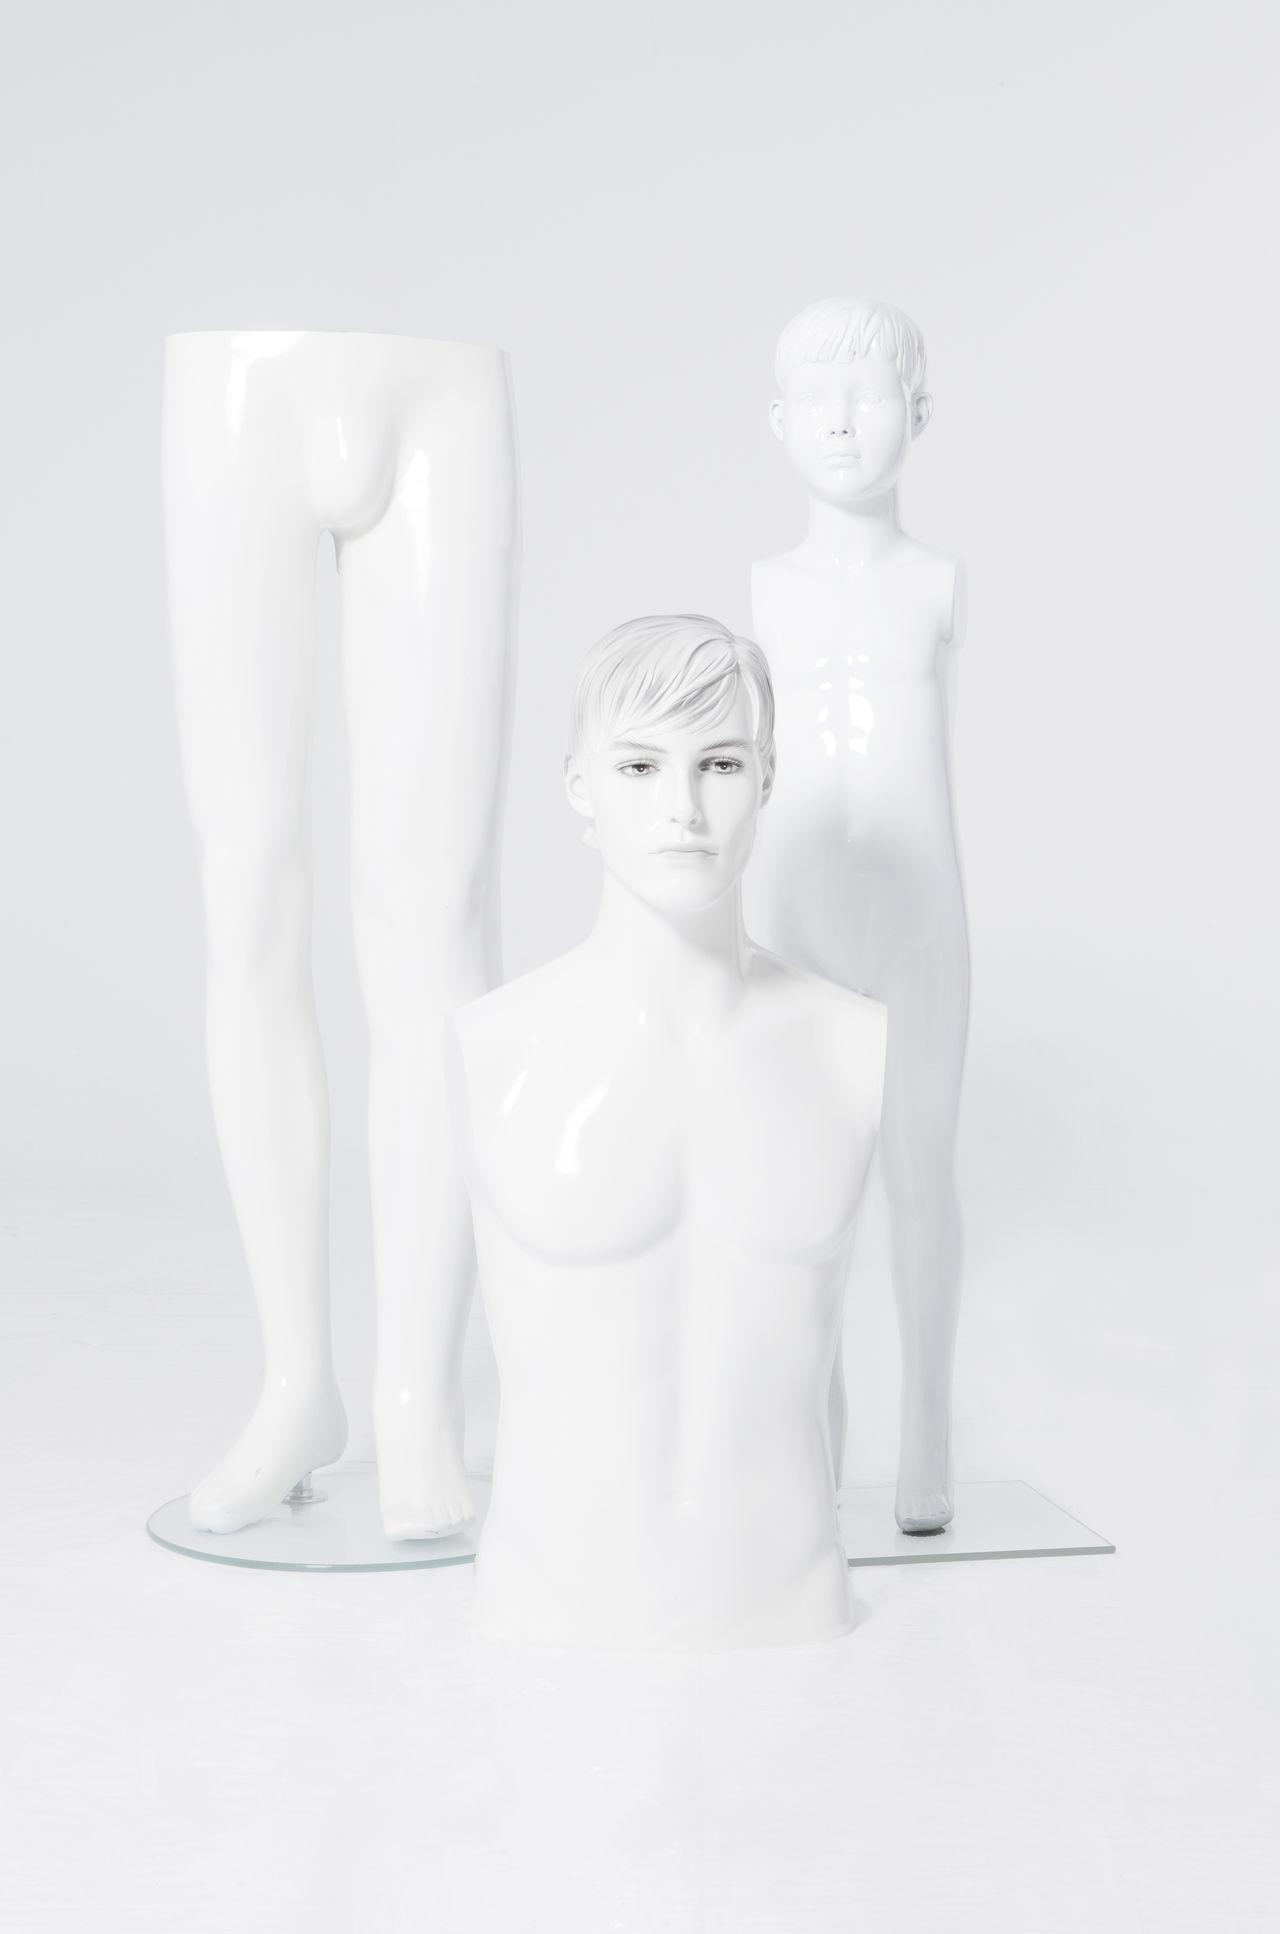 Beautiful stock photos of medizin, human representation, still life, single object, indoors